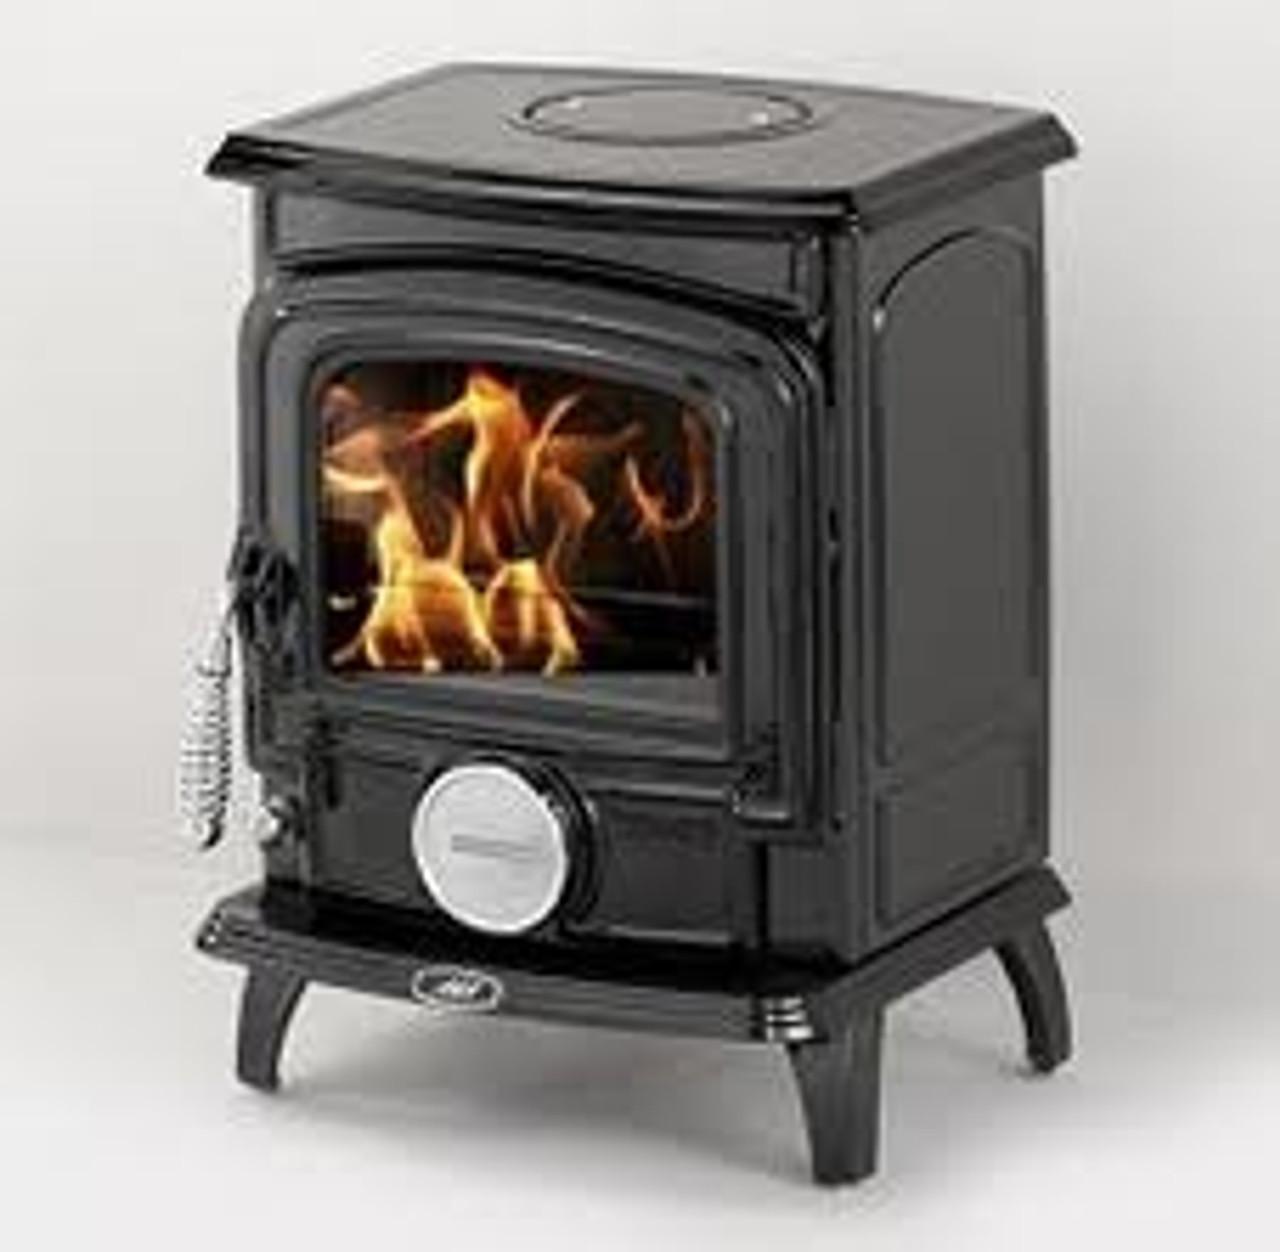 Aga little wenlock multifuel stove